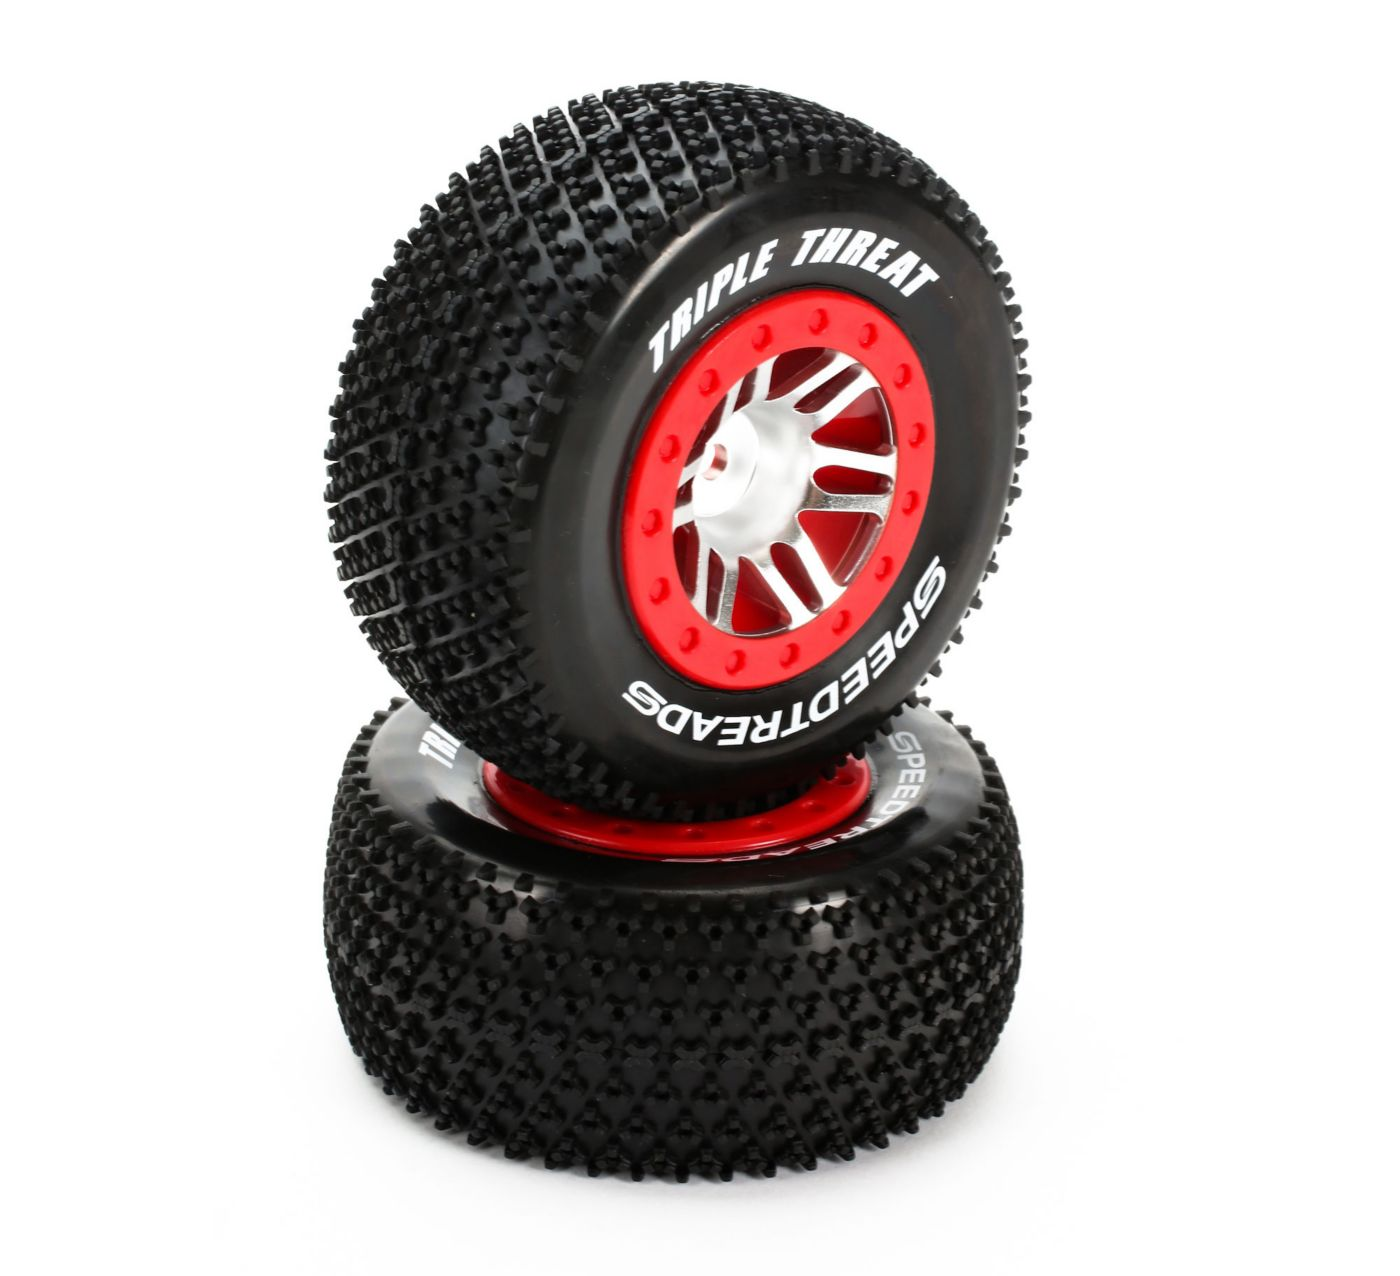 SpeedTreads™ Triple Threat™ SC tires Mounted: SLH R, 4X4 F/R, Front ECX (2)  (DYN5129)